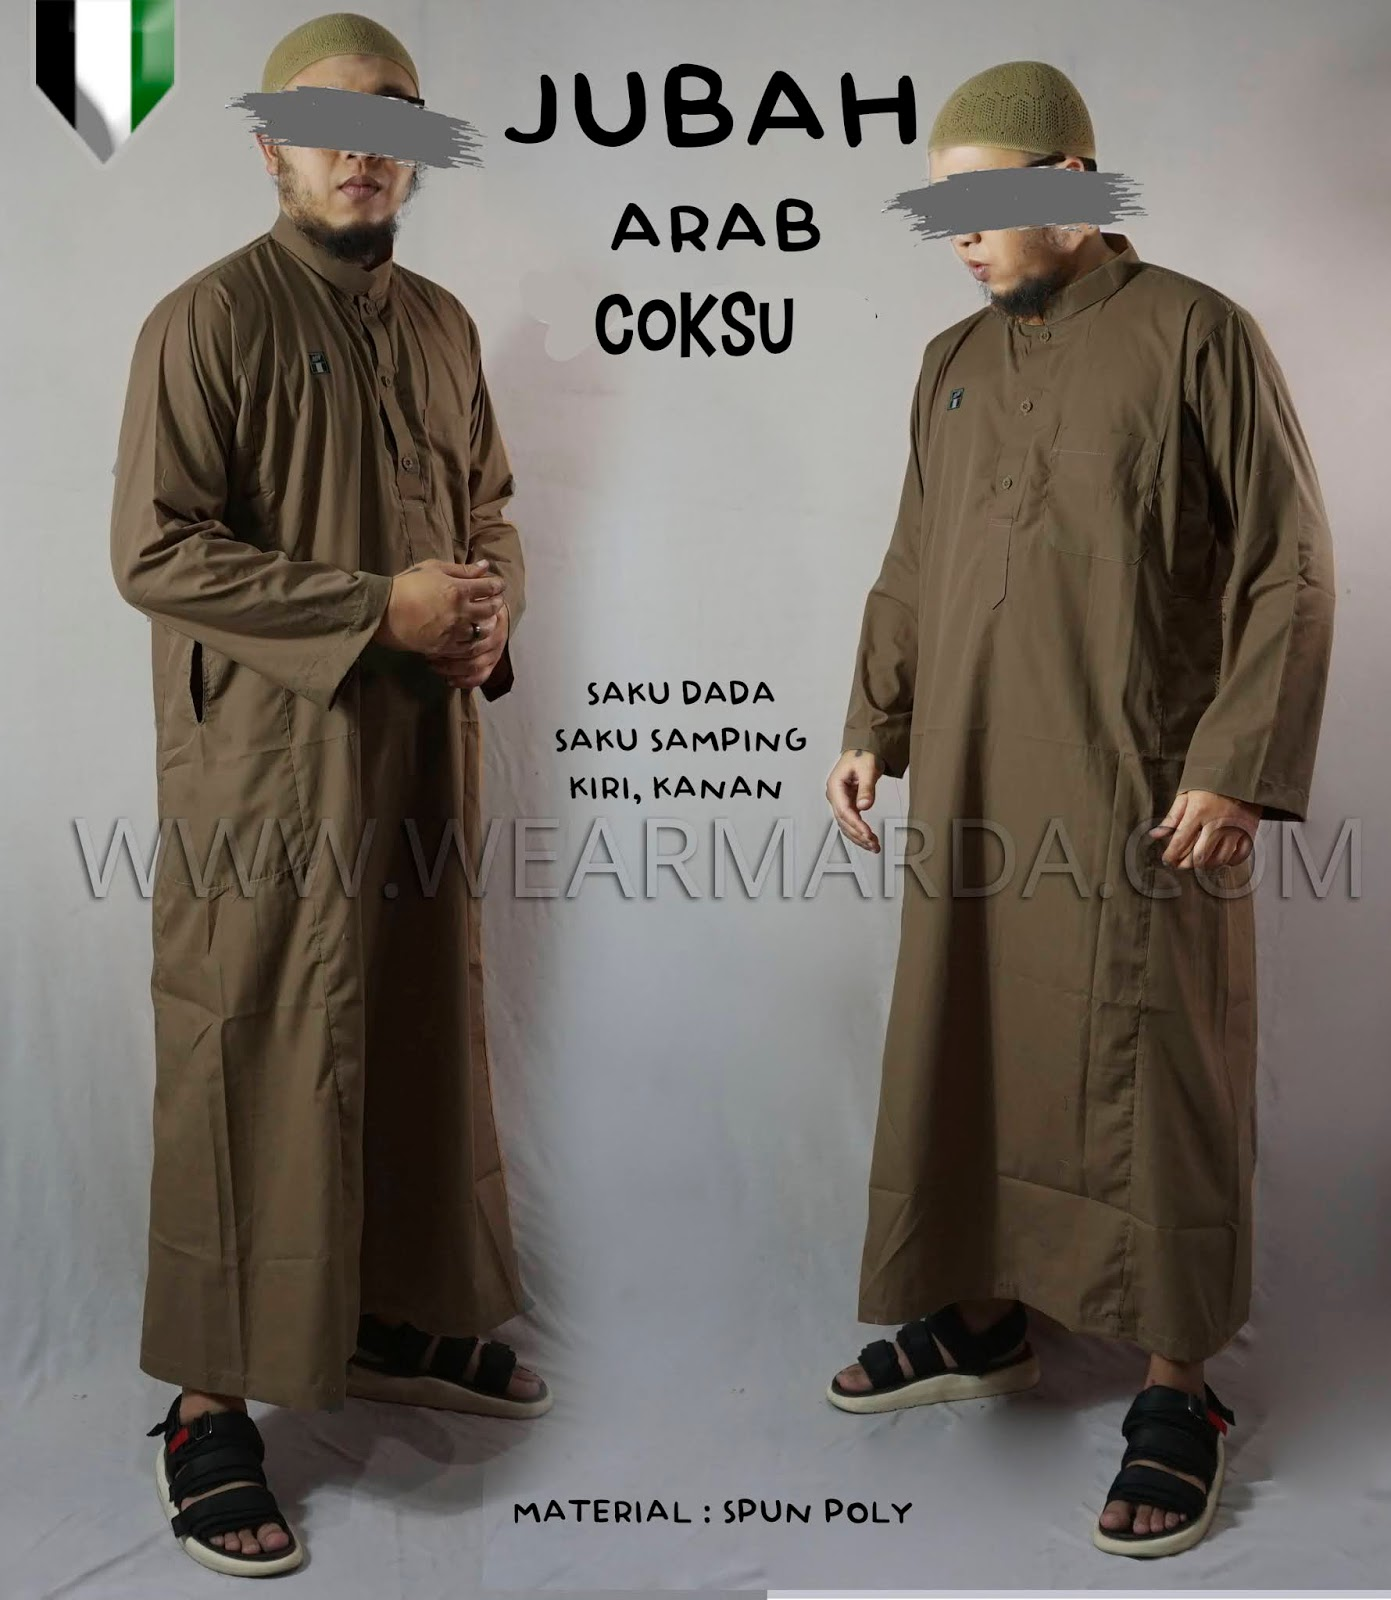 JUBAH ARAB COKSU